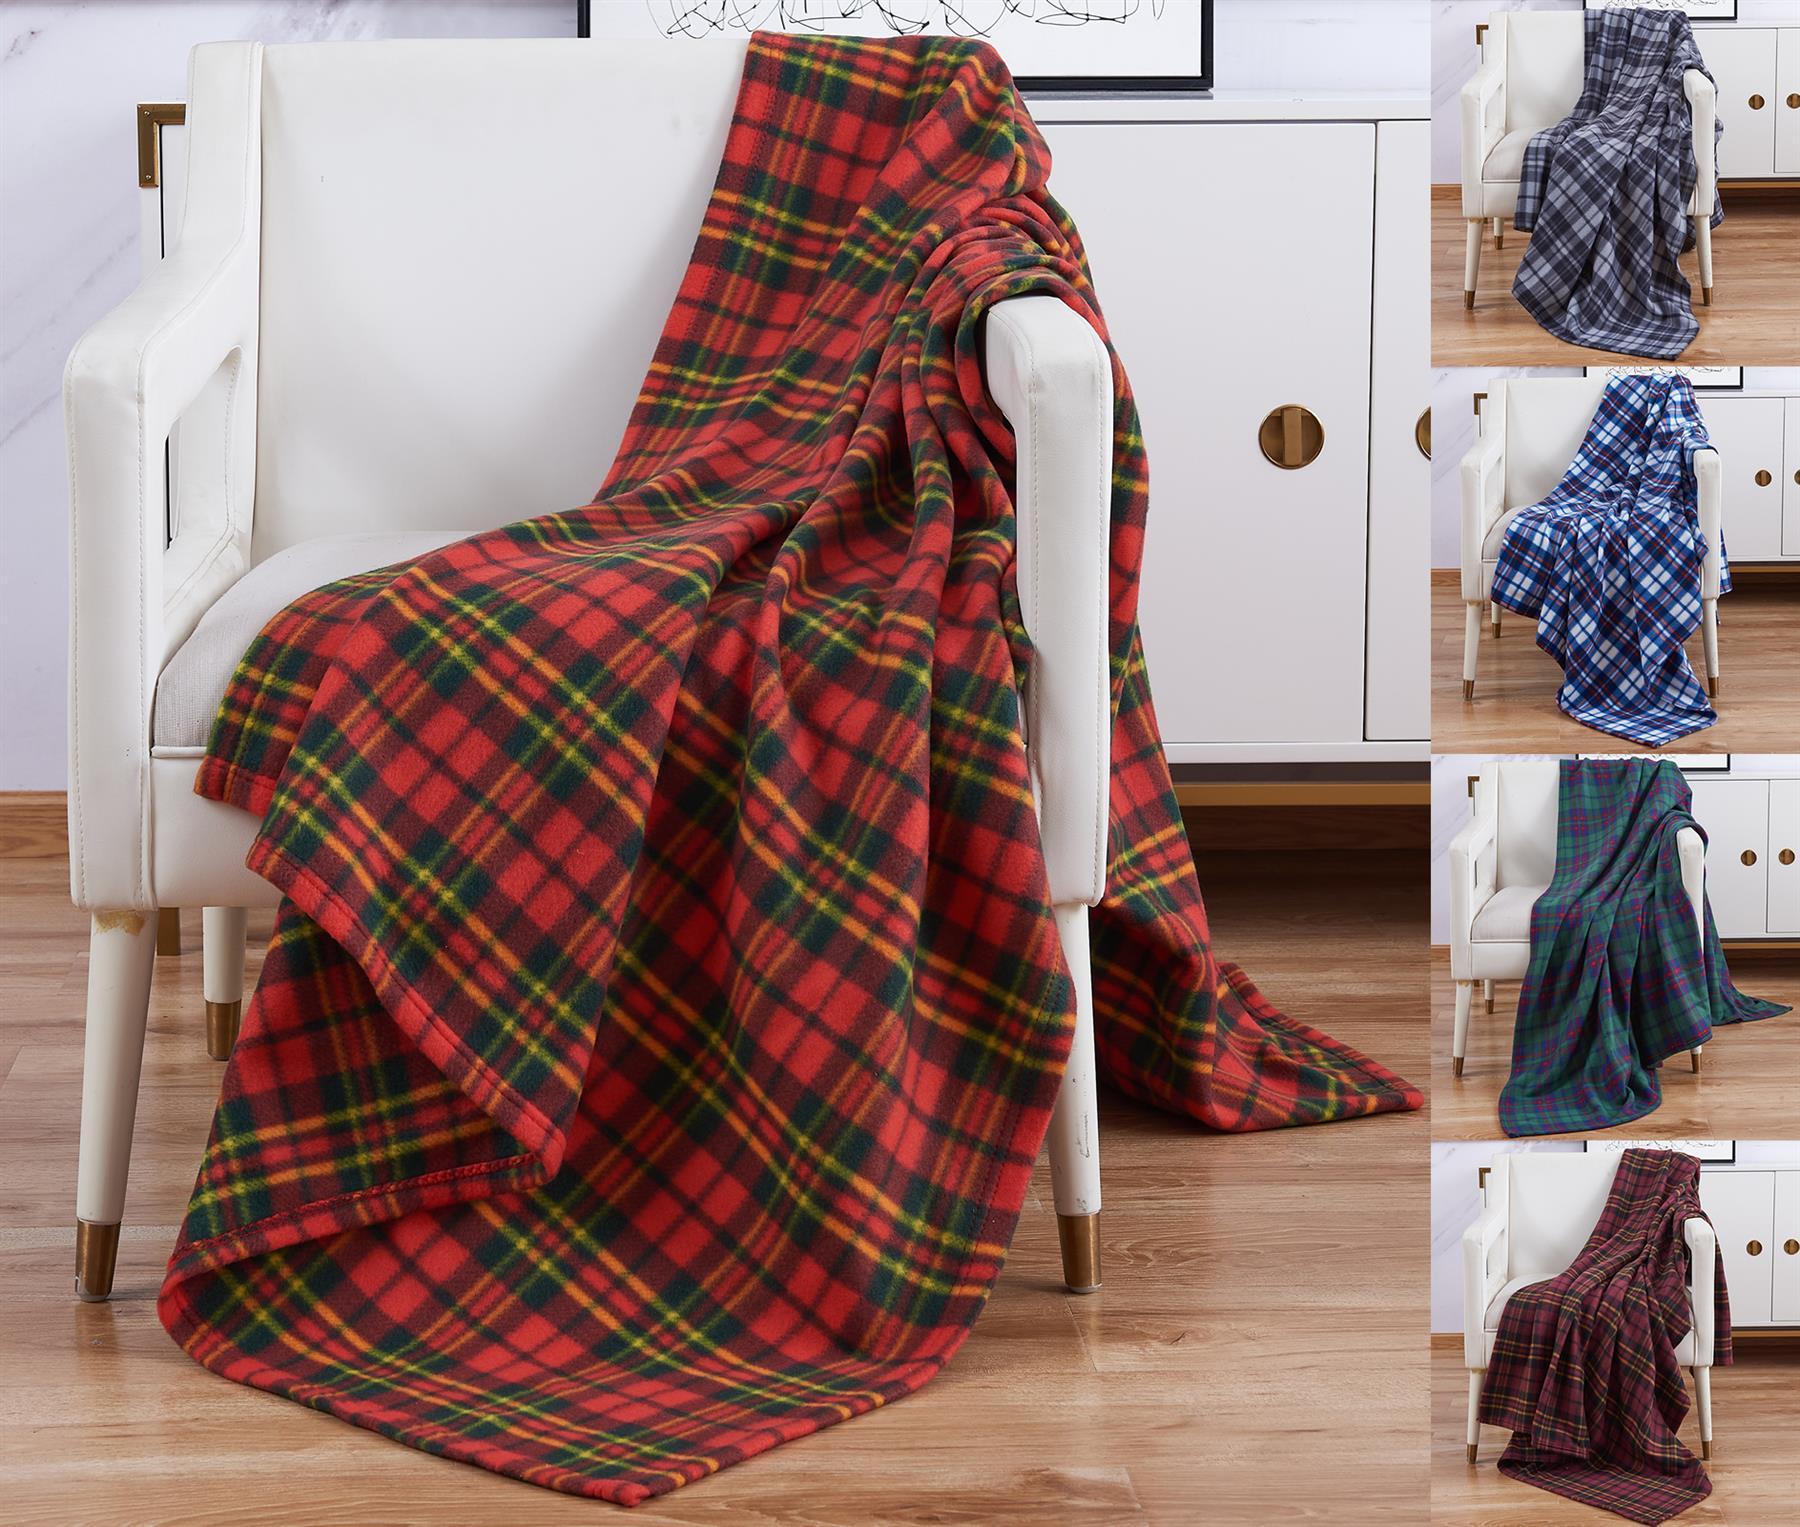 Soft Flannel Fleece Sofa Bed Blanket Throw Checked Design Large Warm 150 x 200CM